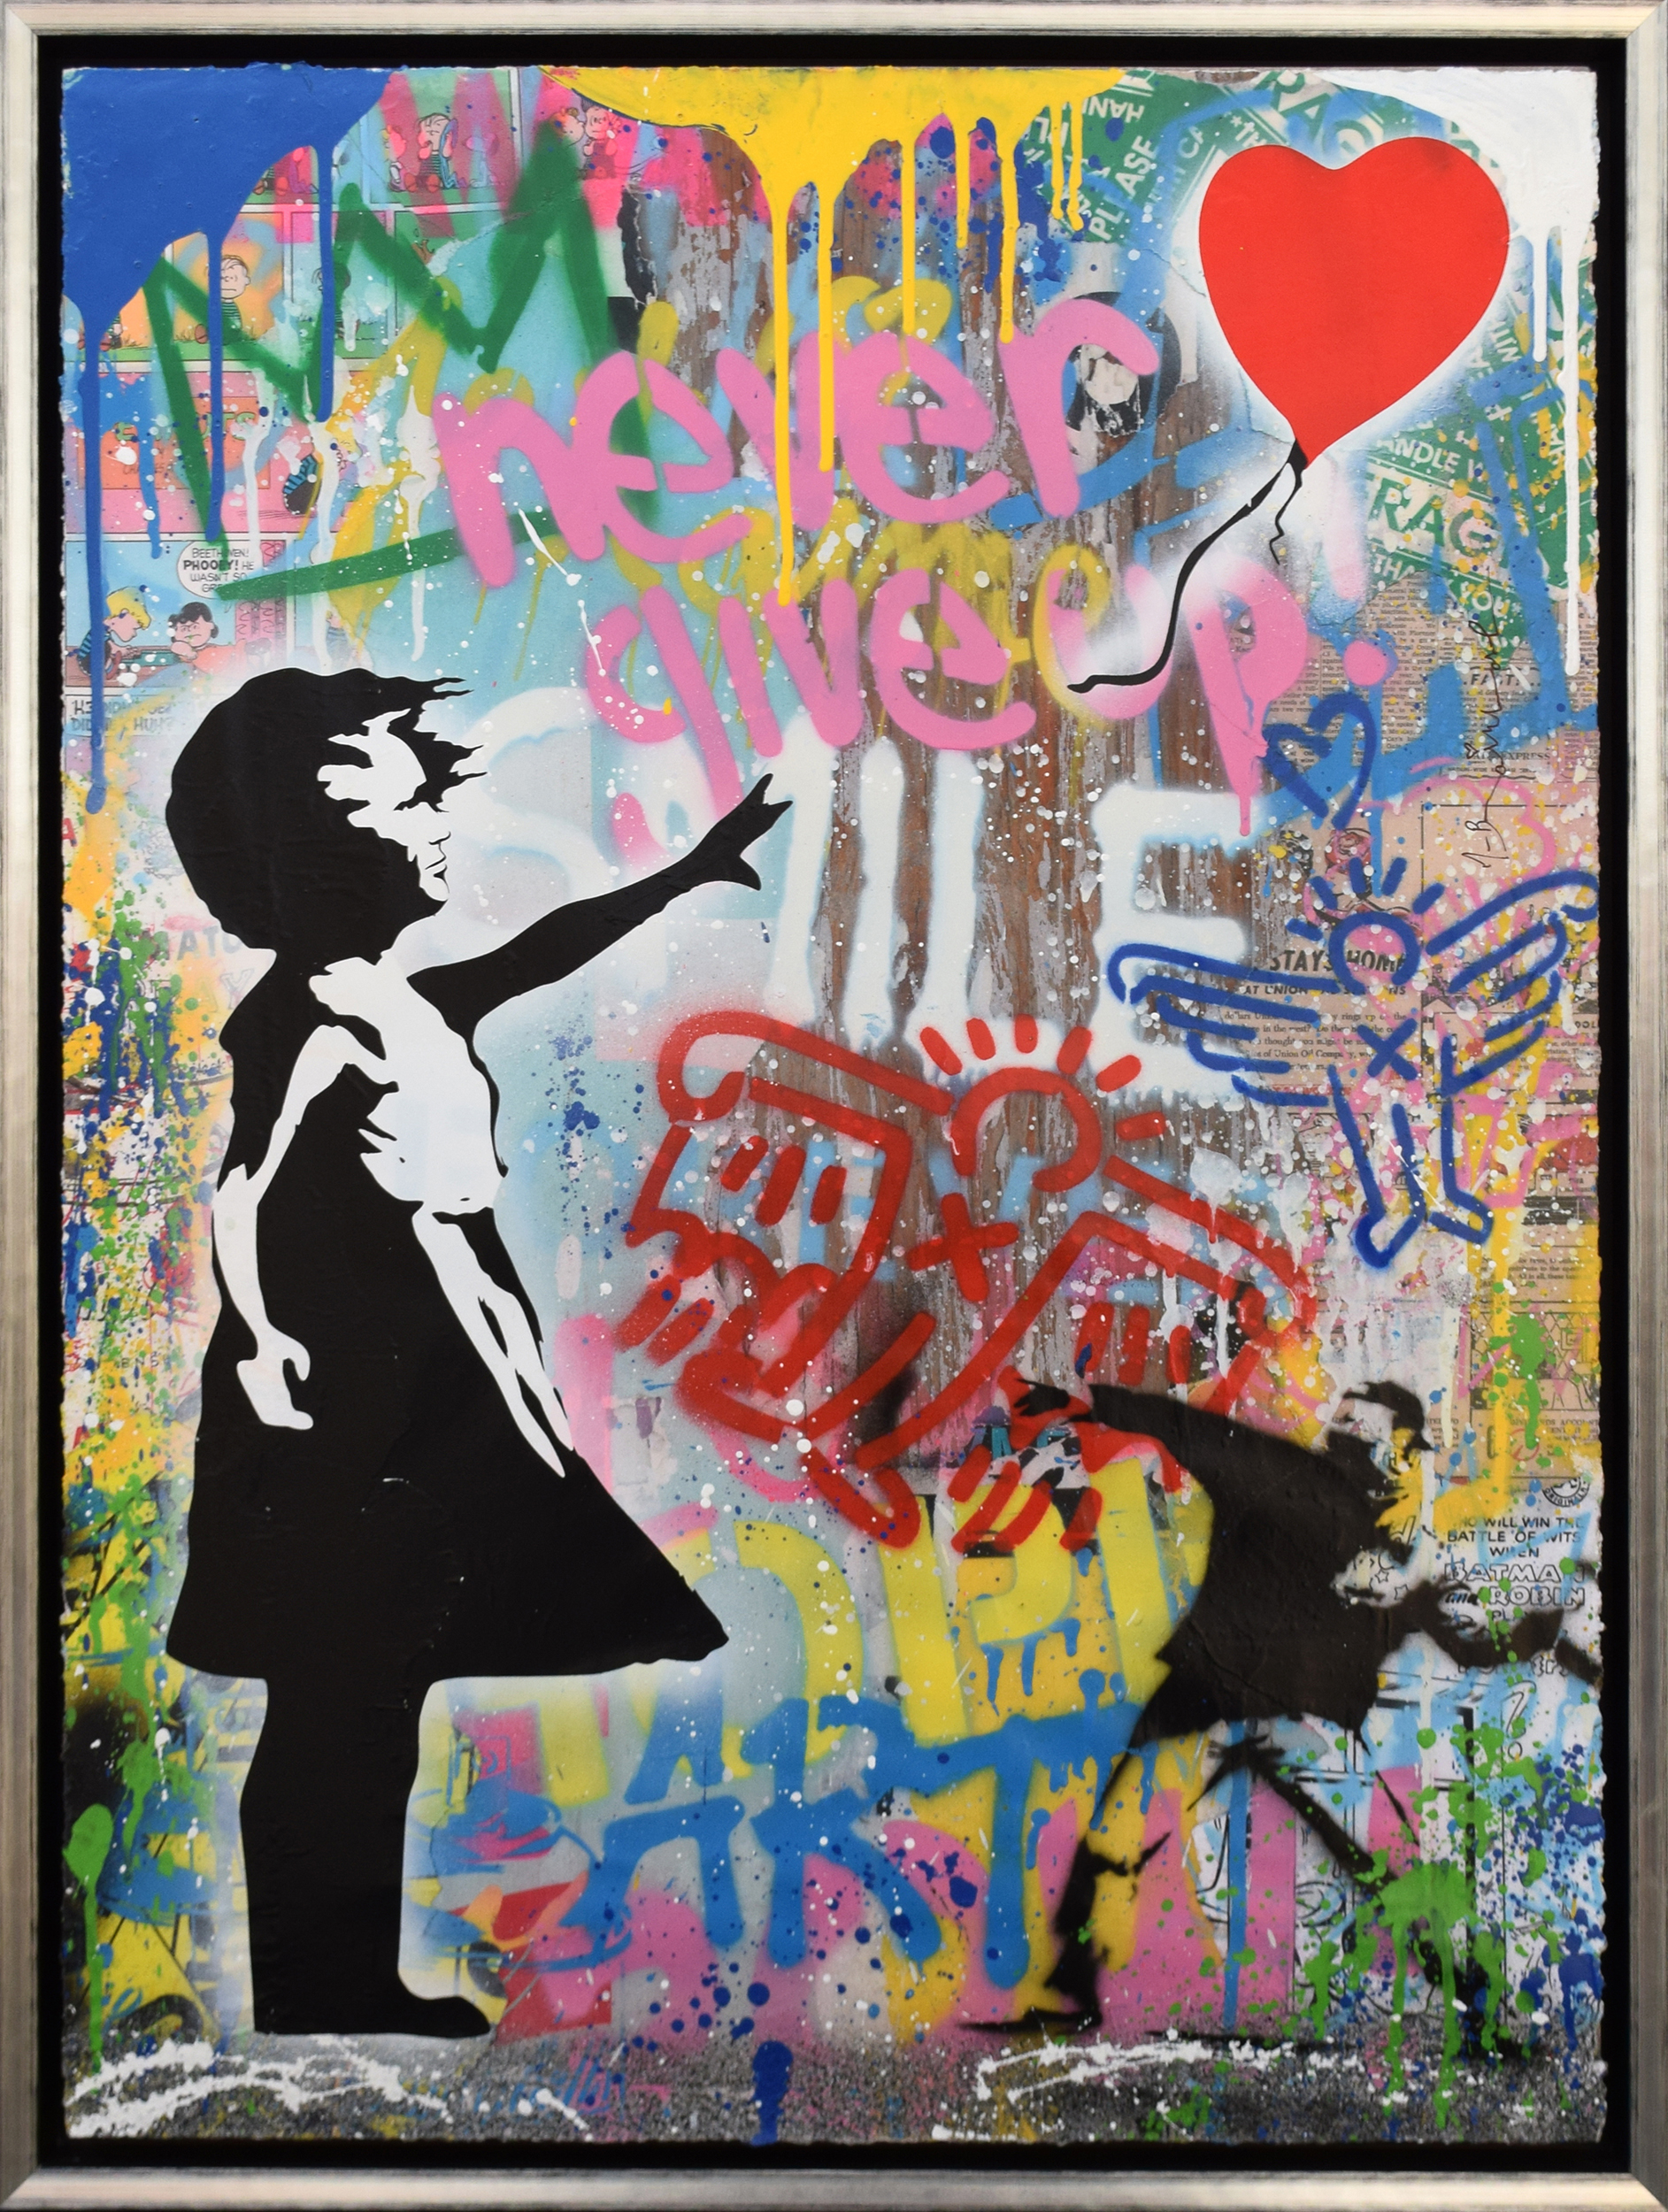 Mr. Brainwash - Balloon Girl (with Banksy Thrower) , 9003-012-159